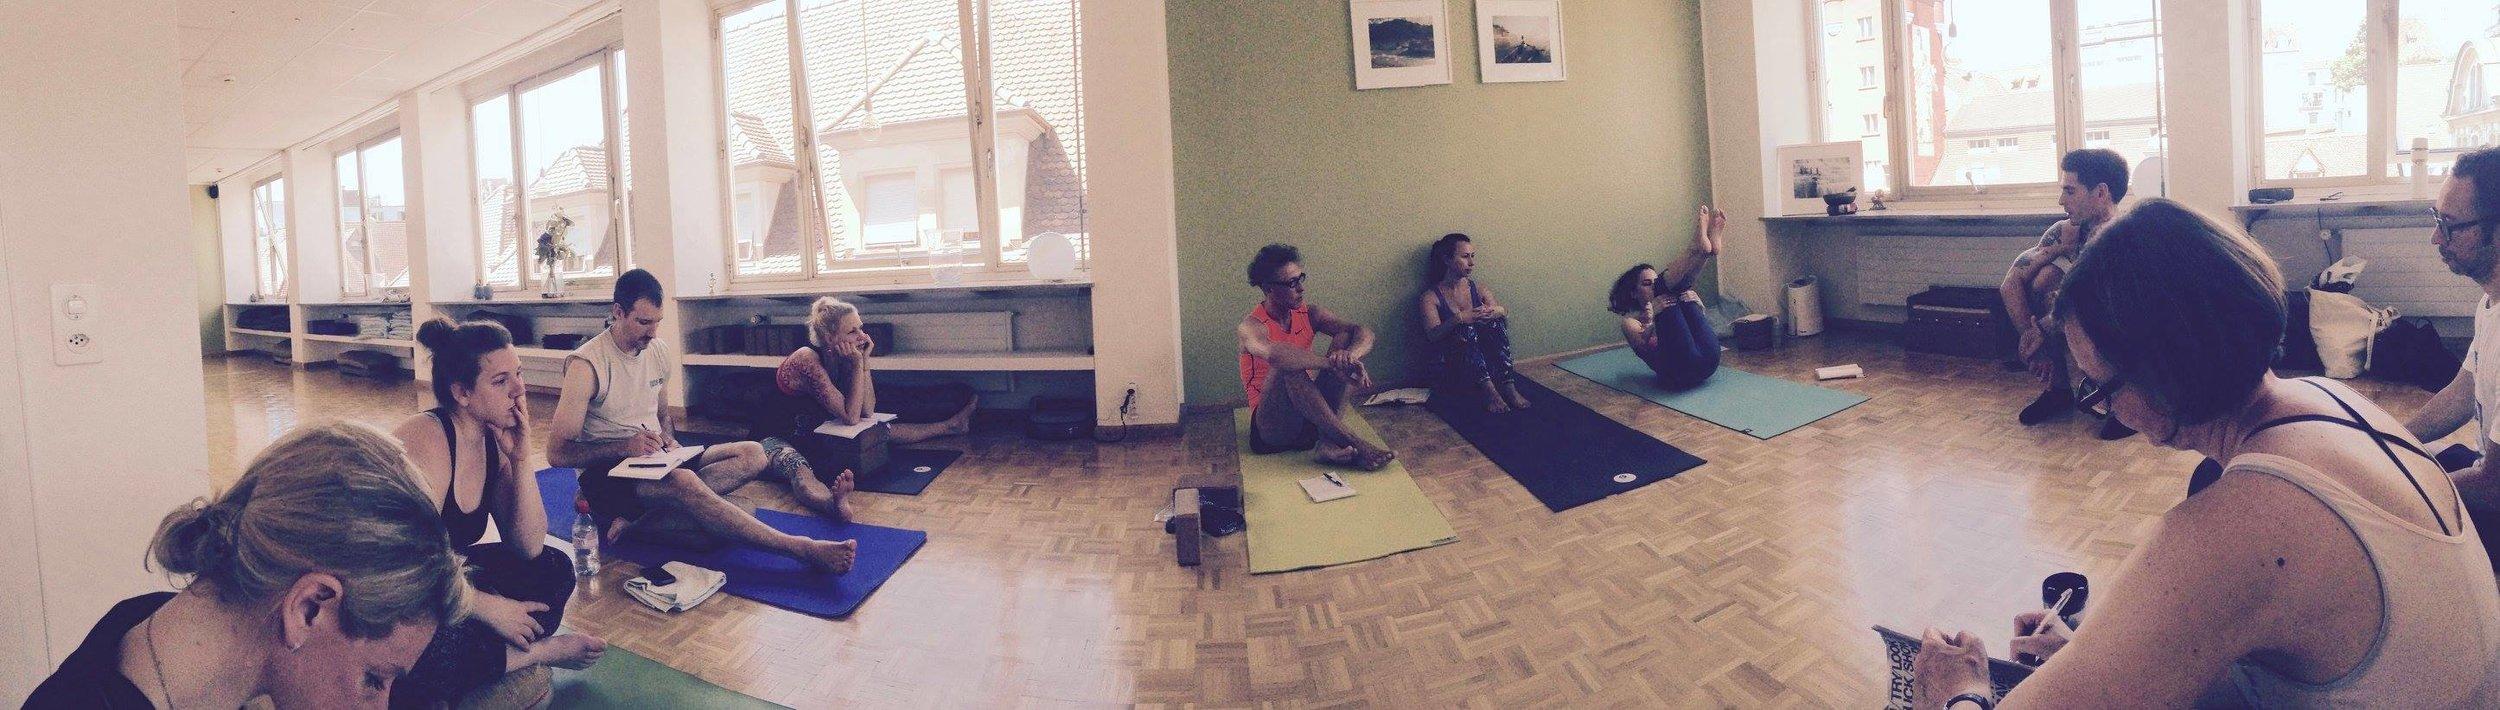 Yoga Teacher Traninig